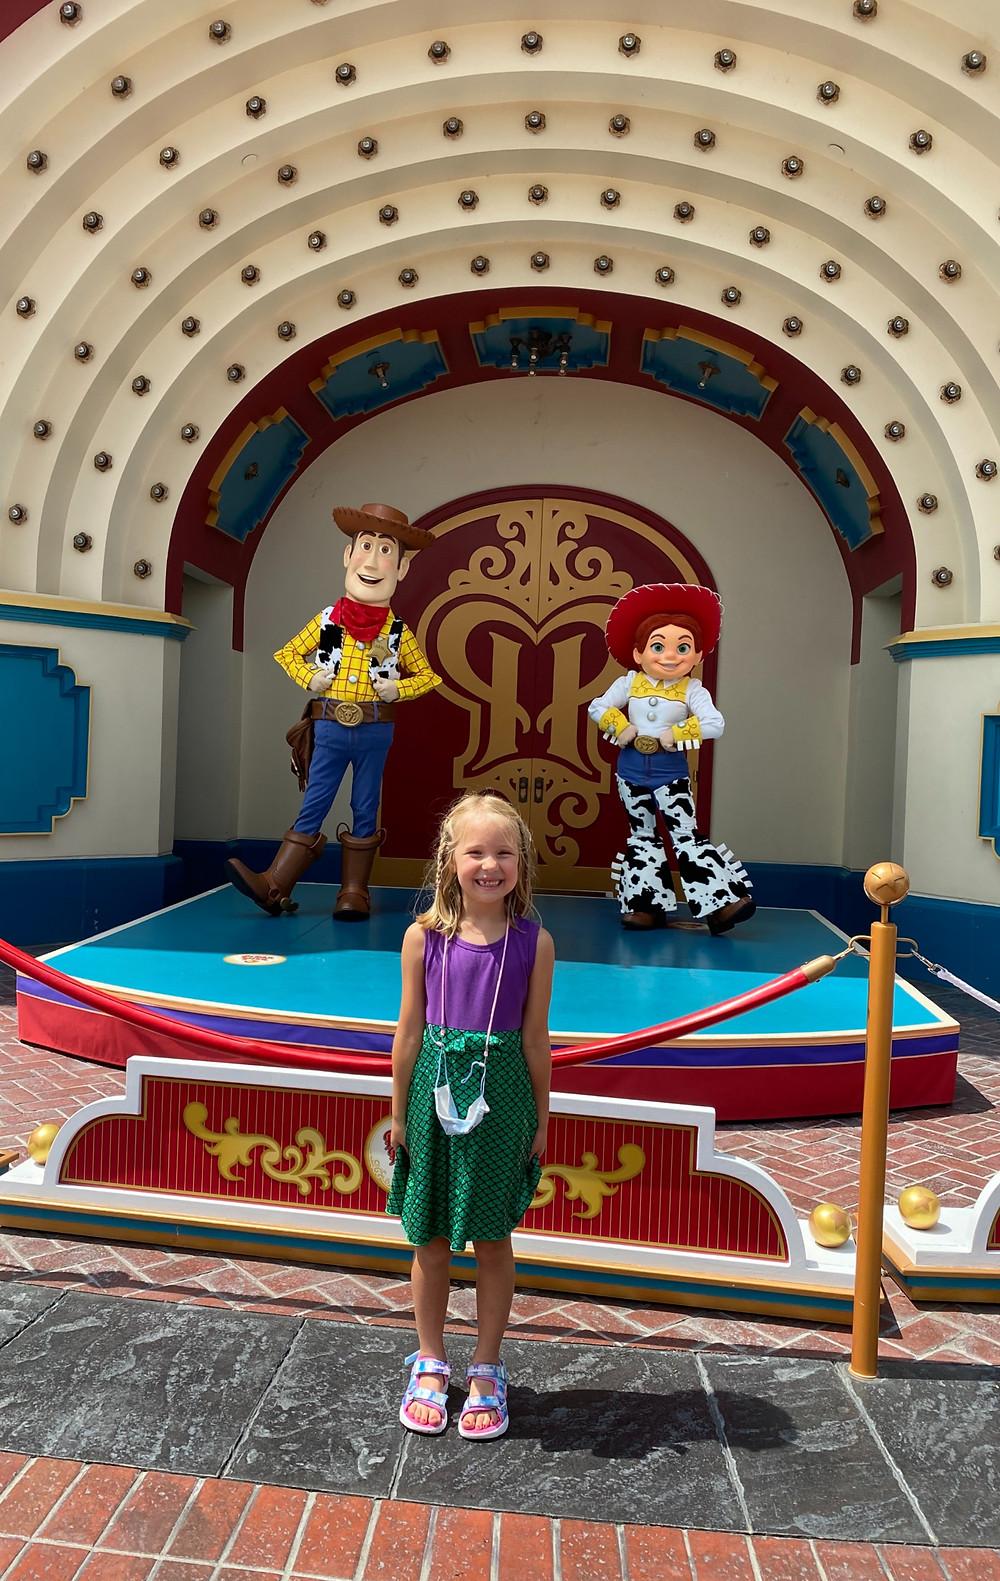 Finding Disneyland Characters at Disneyland and California Adventure on a Disneyland Vacation